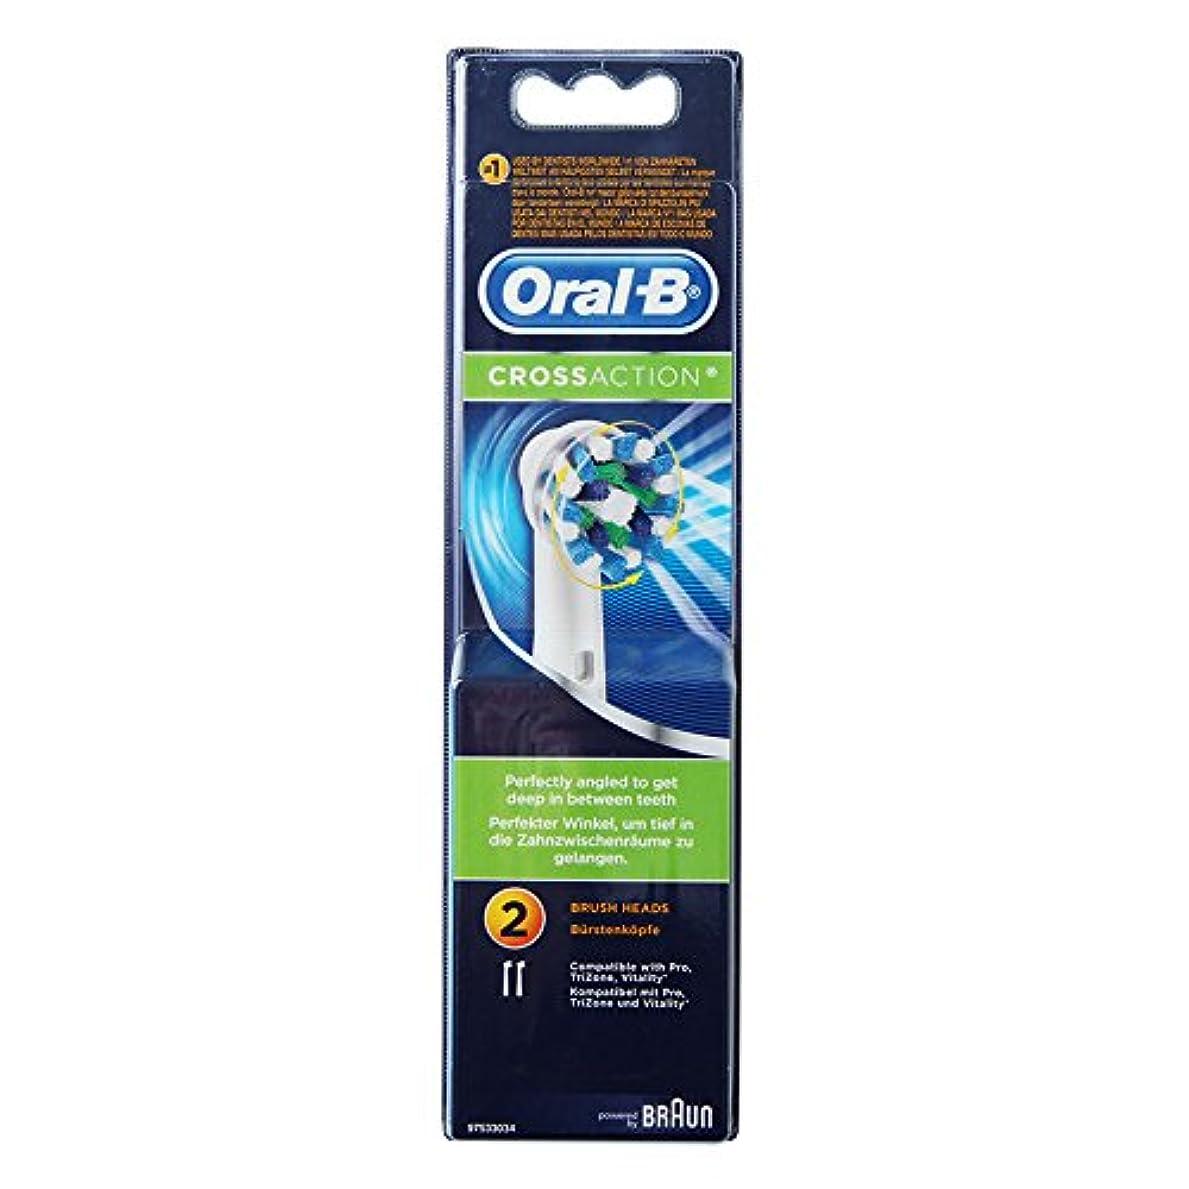 Braun Oral-B EB50-2 Oral-B CrossAction 歯ブラシ交換用ブラシヘッド 1Pack [並行輸入品]